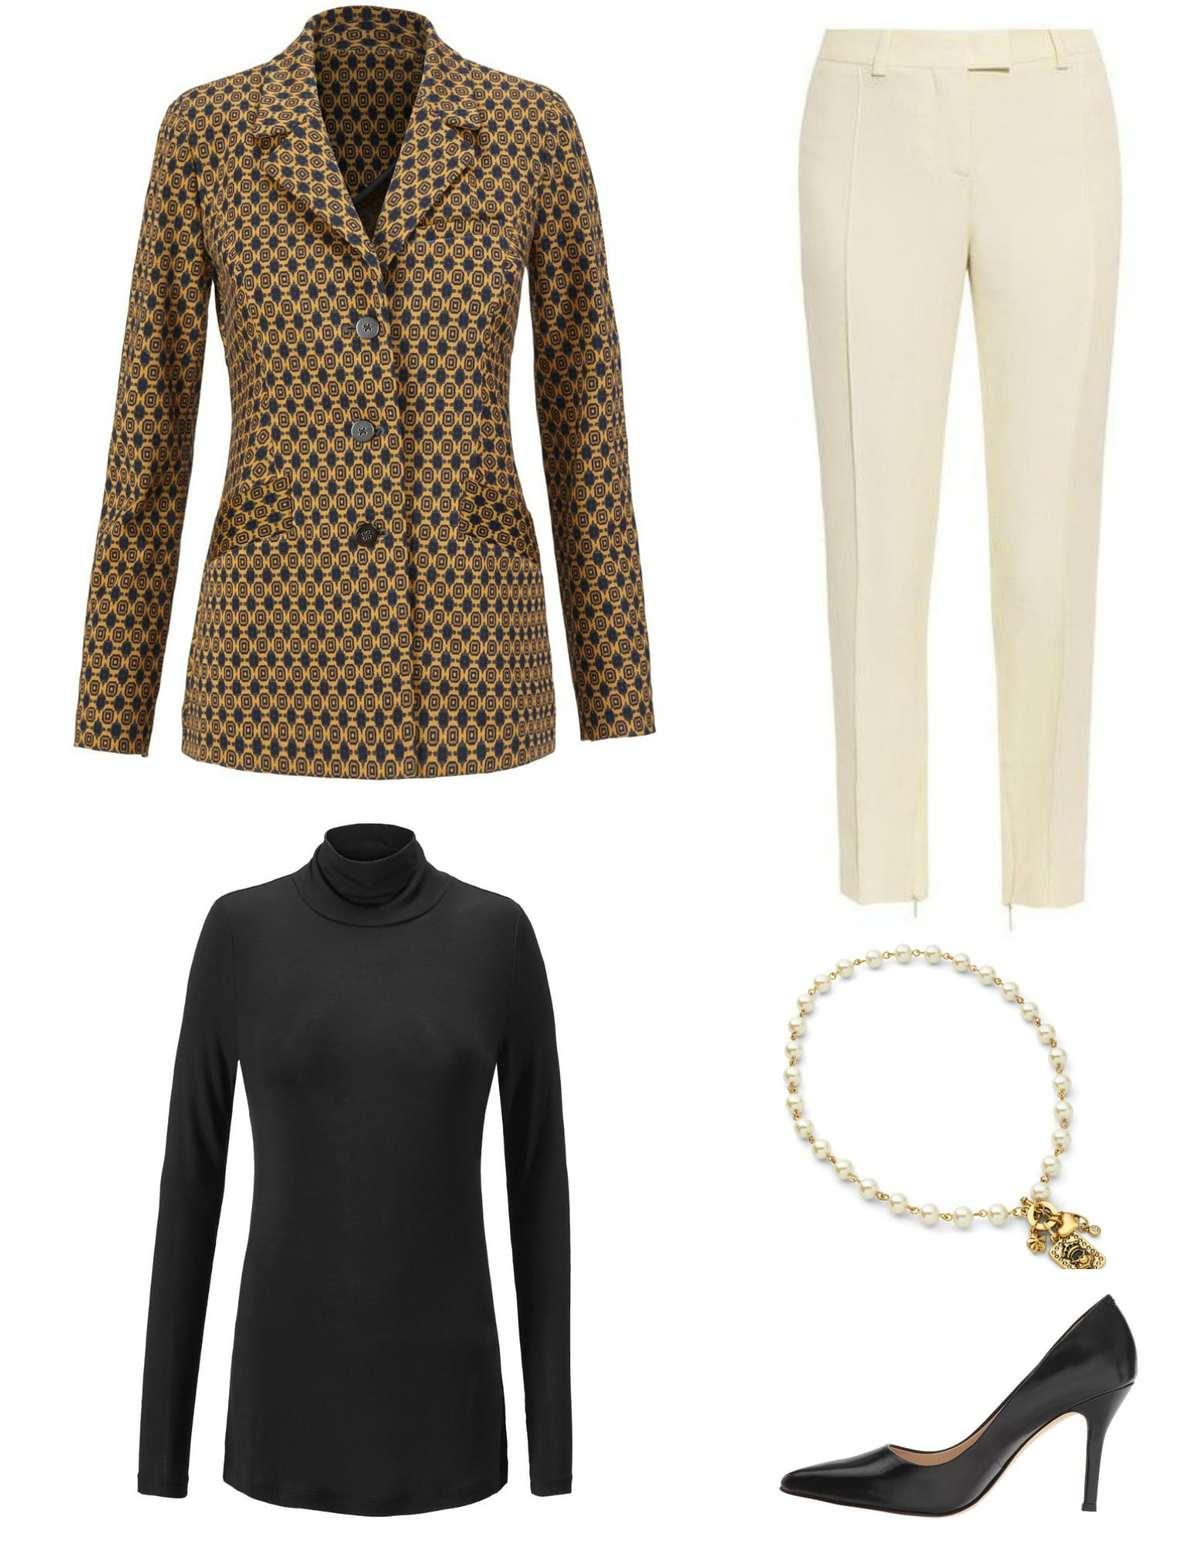 Fall Capsule Wardrobe Inspired By Cabi Wardrobe Oxygen